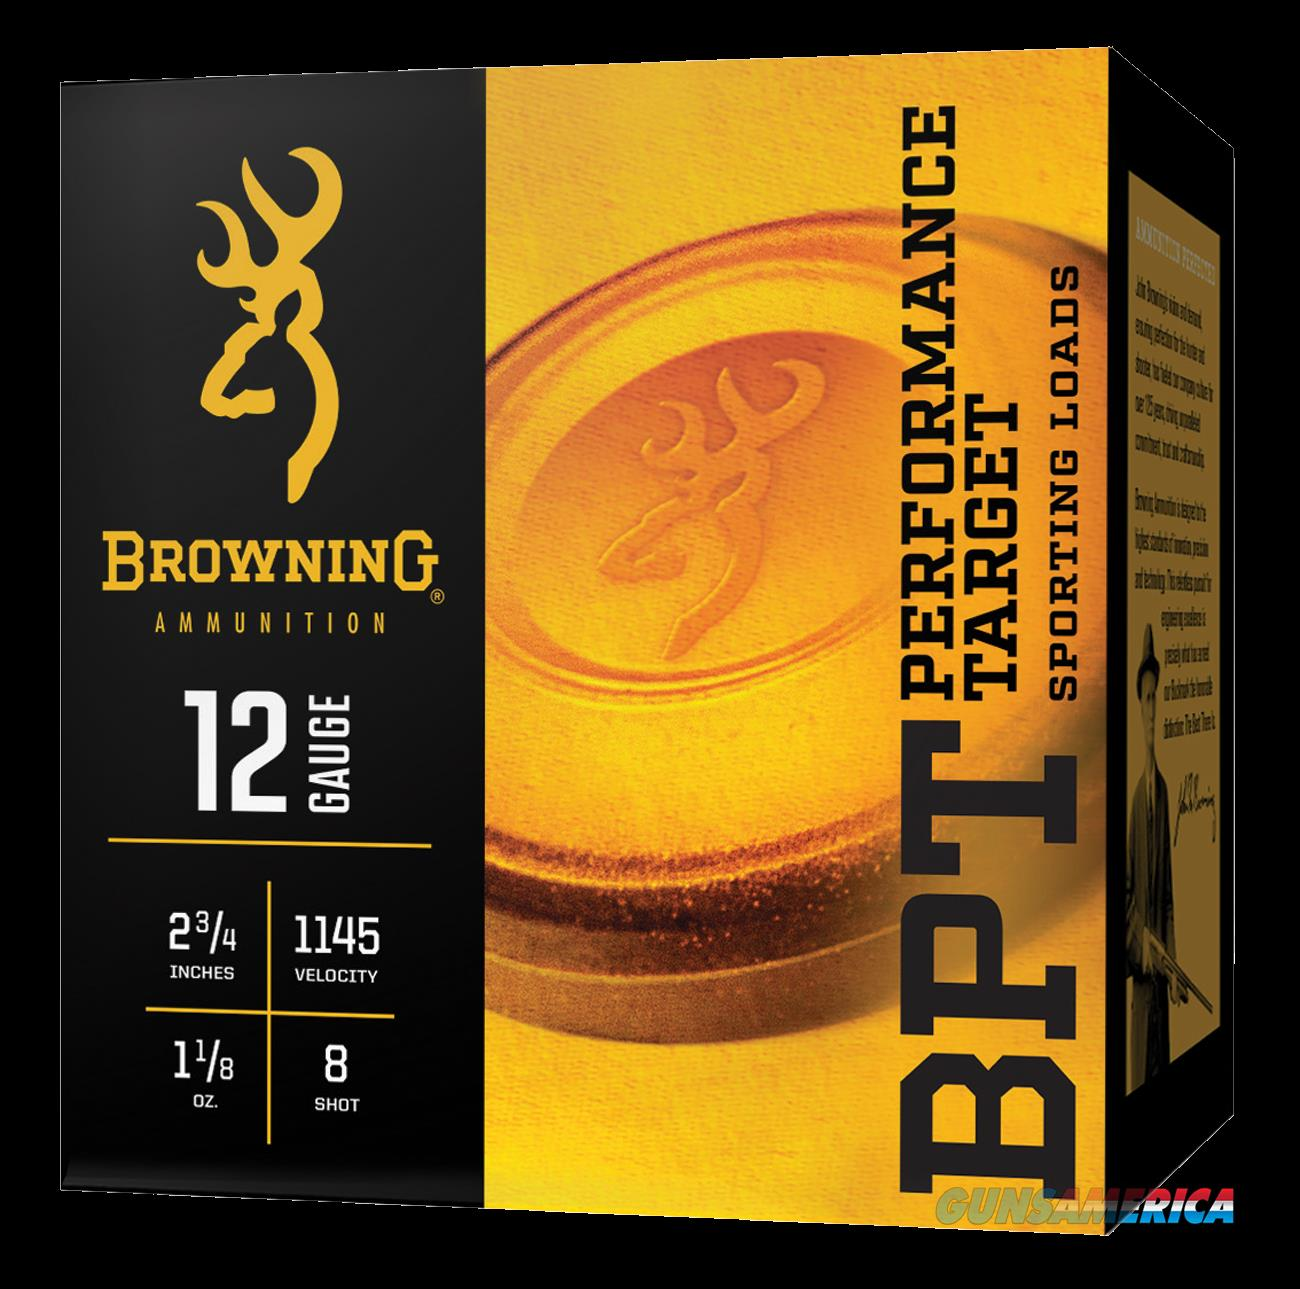 Browning Ammo Bpt, Brna B193611628 16     1oz    8        Trgt  25-10  Guns > Pistols > 1911 Pistol Copies (non-Colt)